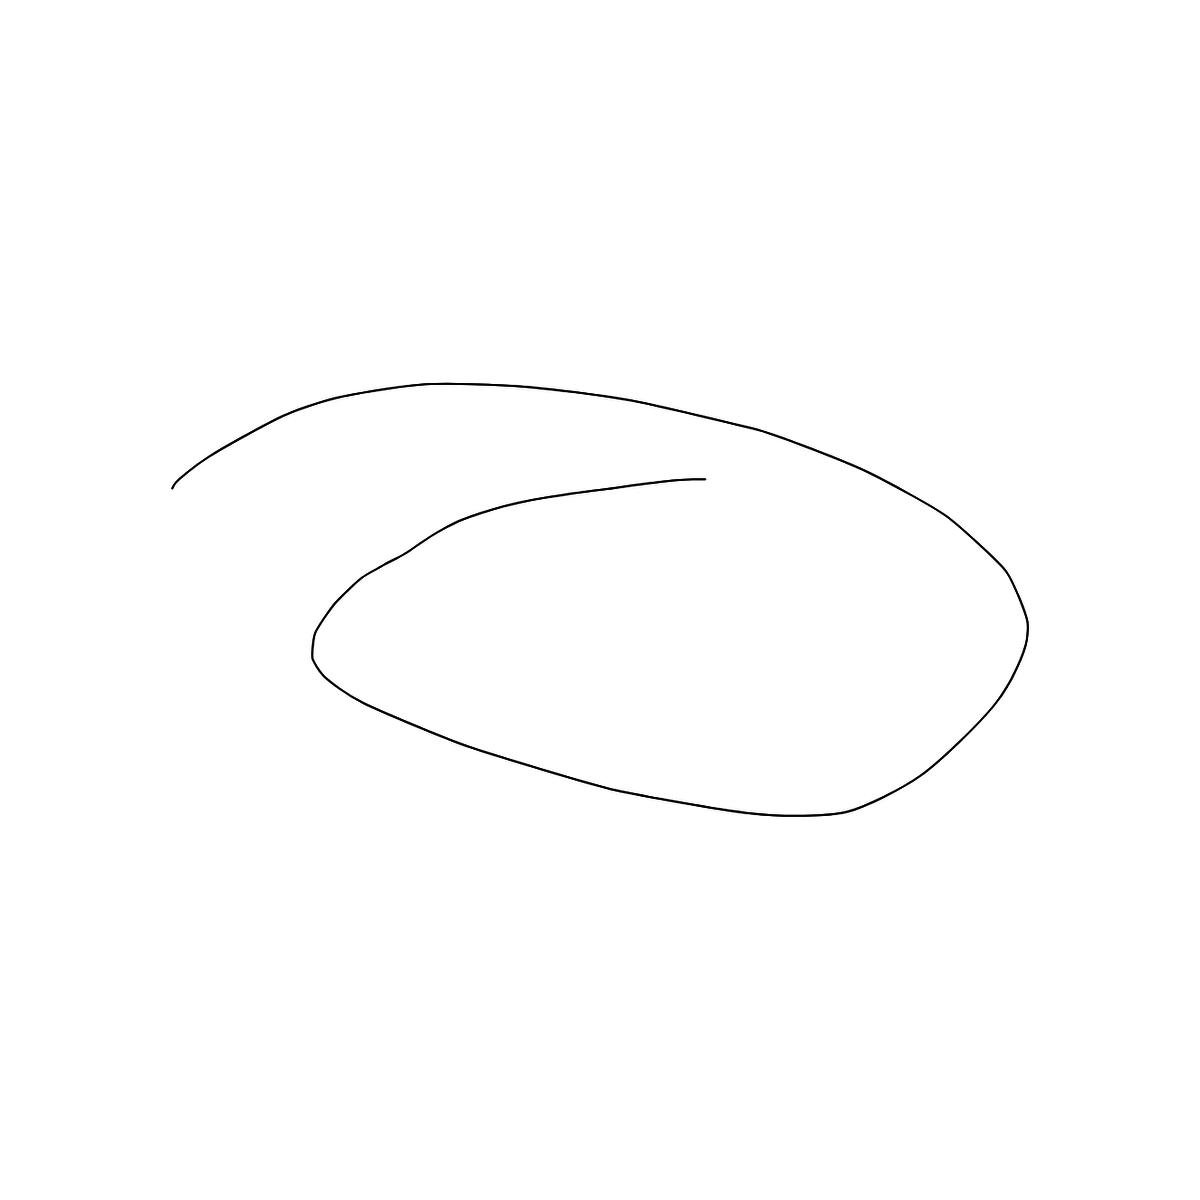 BAAAM drawing#23878 lat:43.7724494934082000lng: 11.2184066772460940